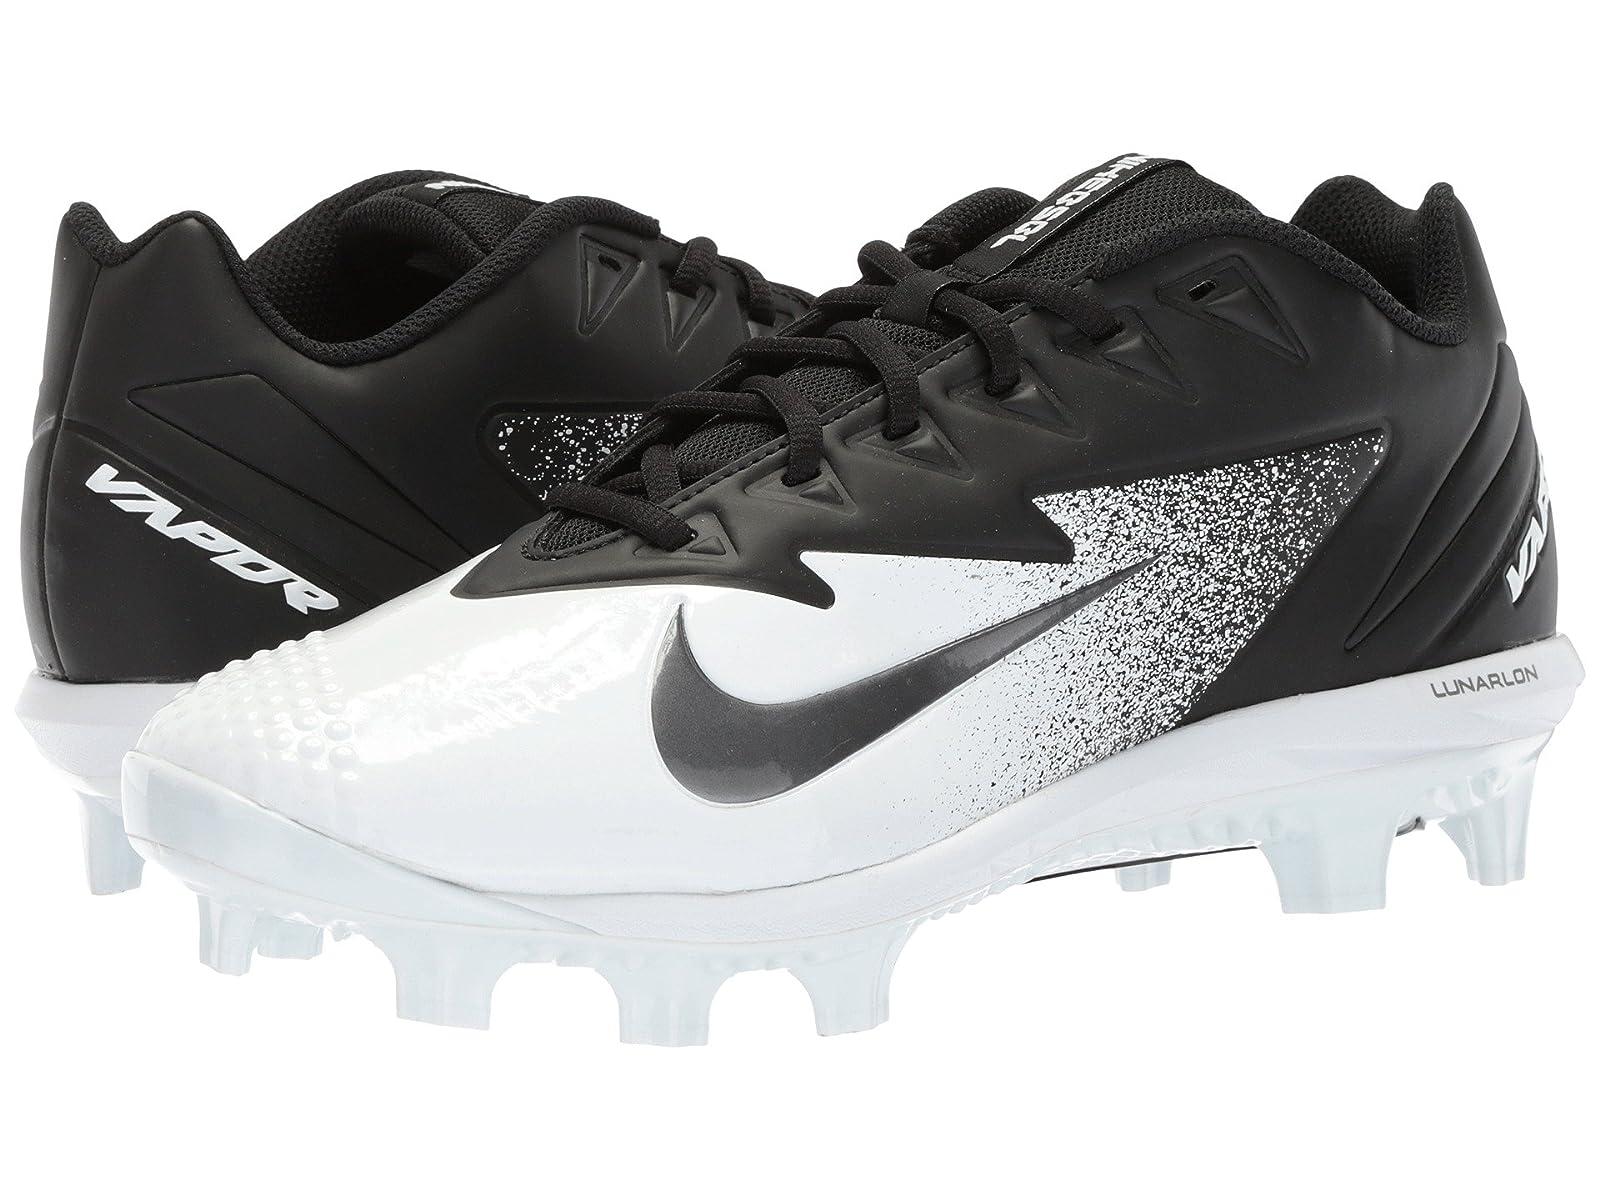 Men's/Women's < Nike  Vapor Ultrafly Pro MCS  Nike < elegant appearance 49062f